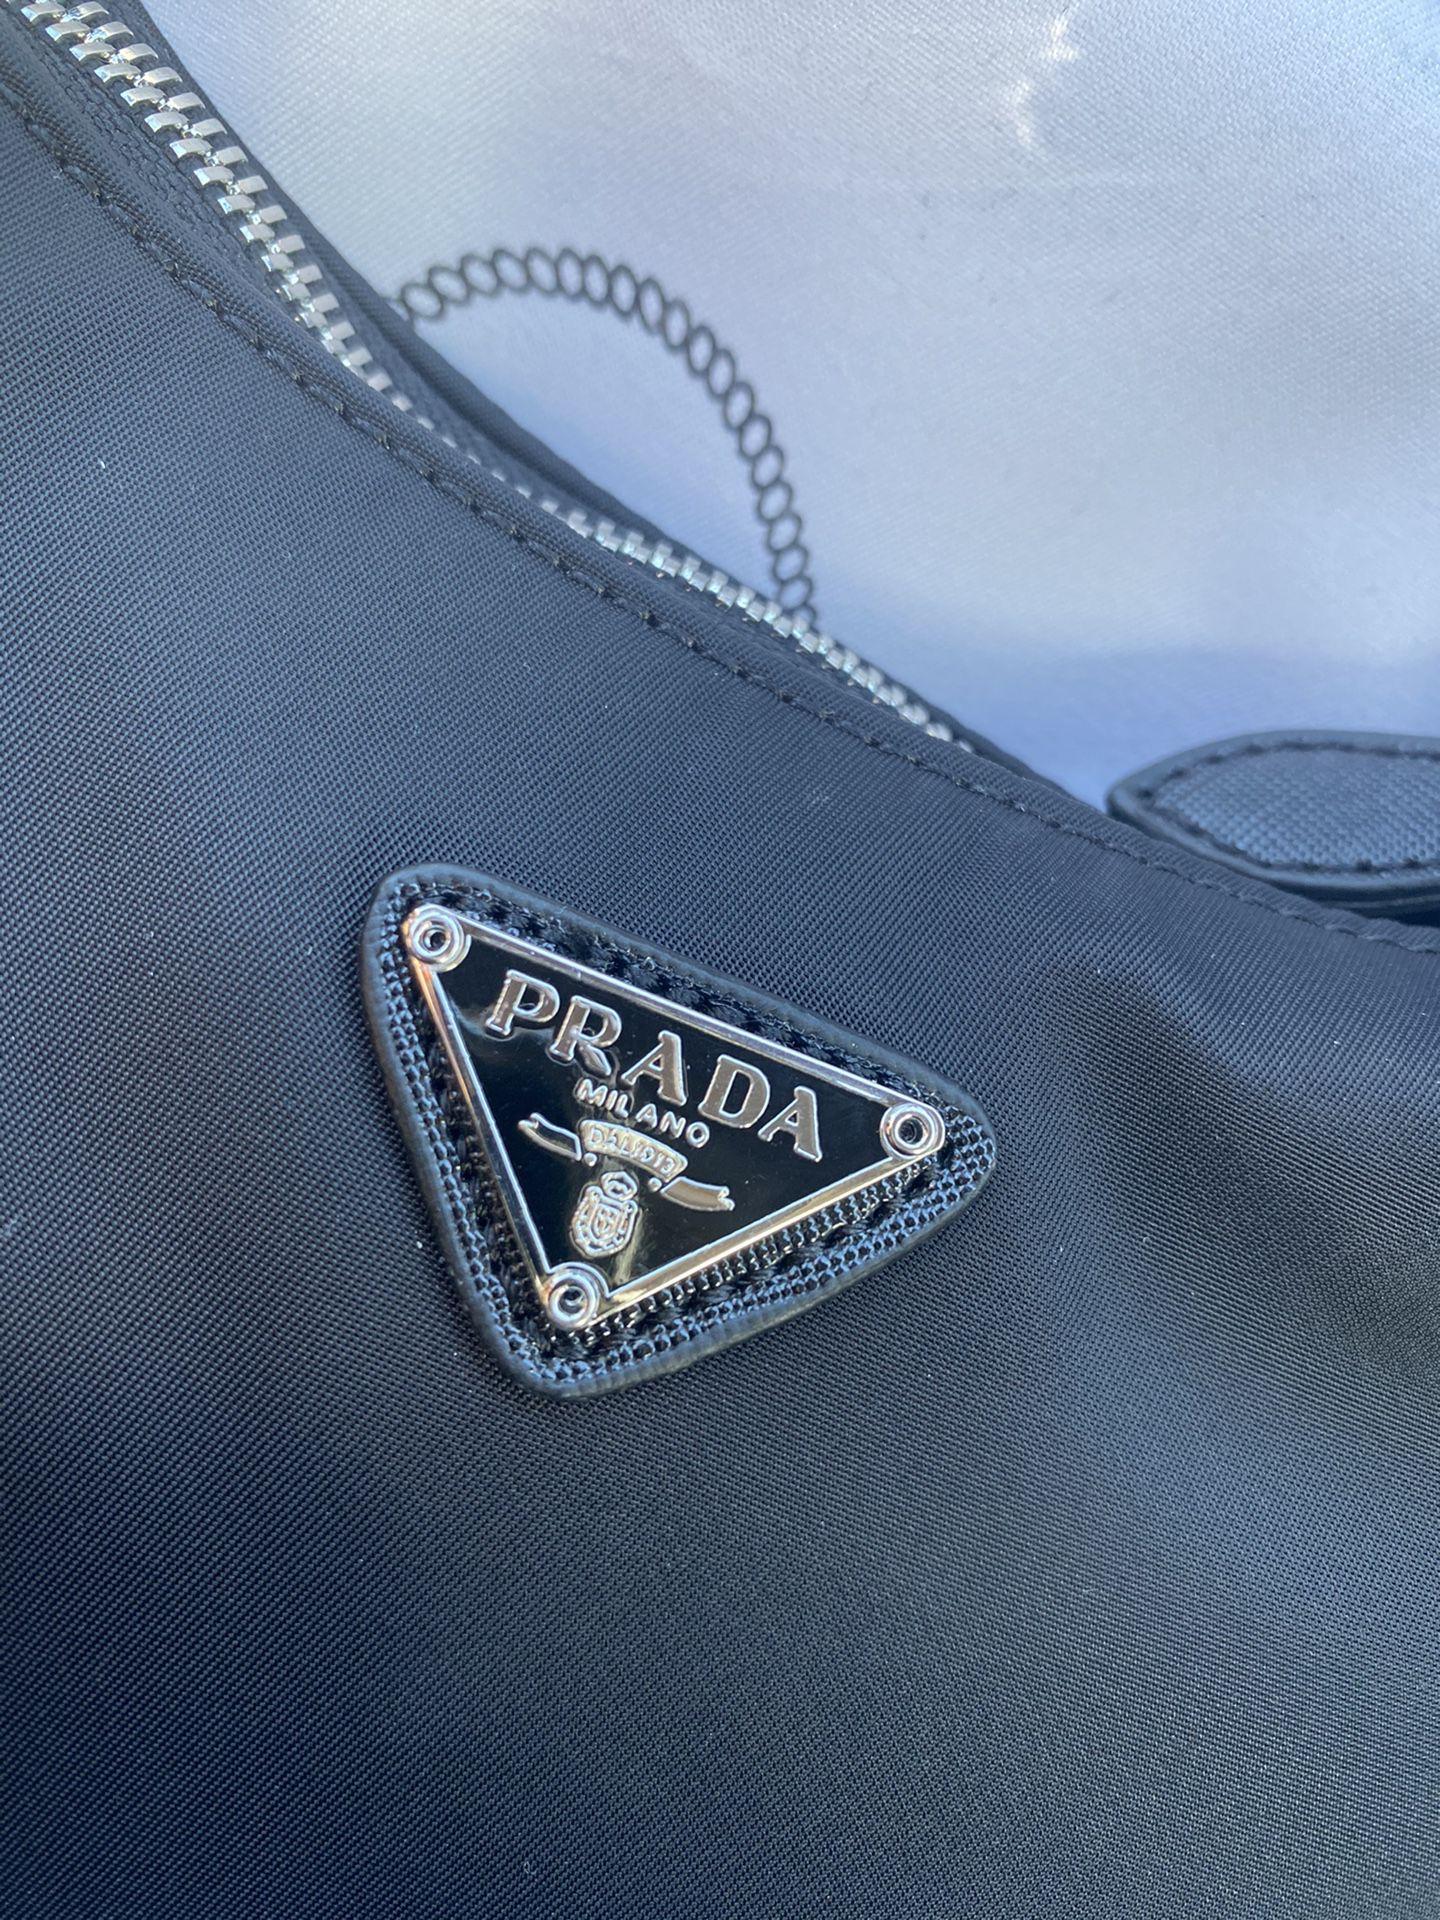 Prada Nylon Re-edition bag